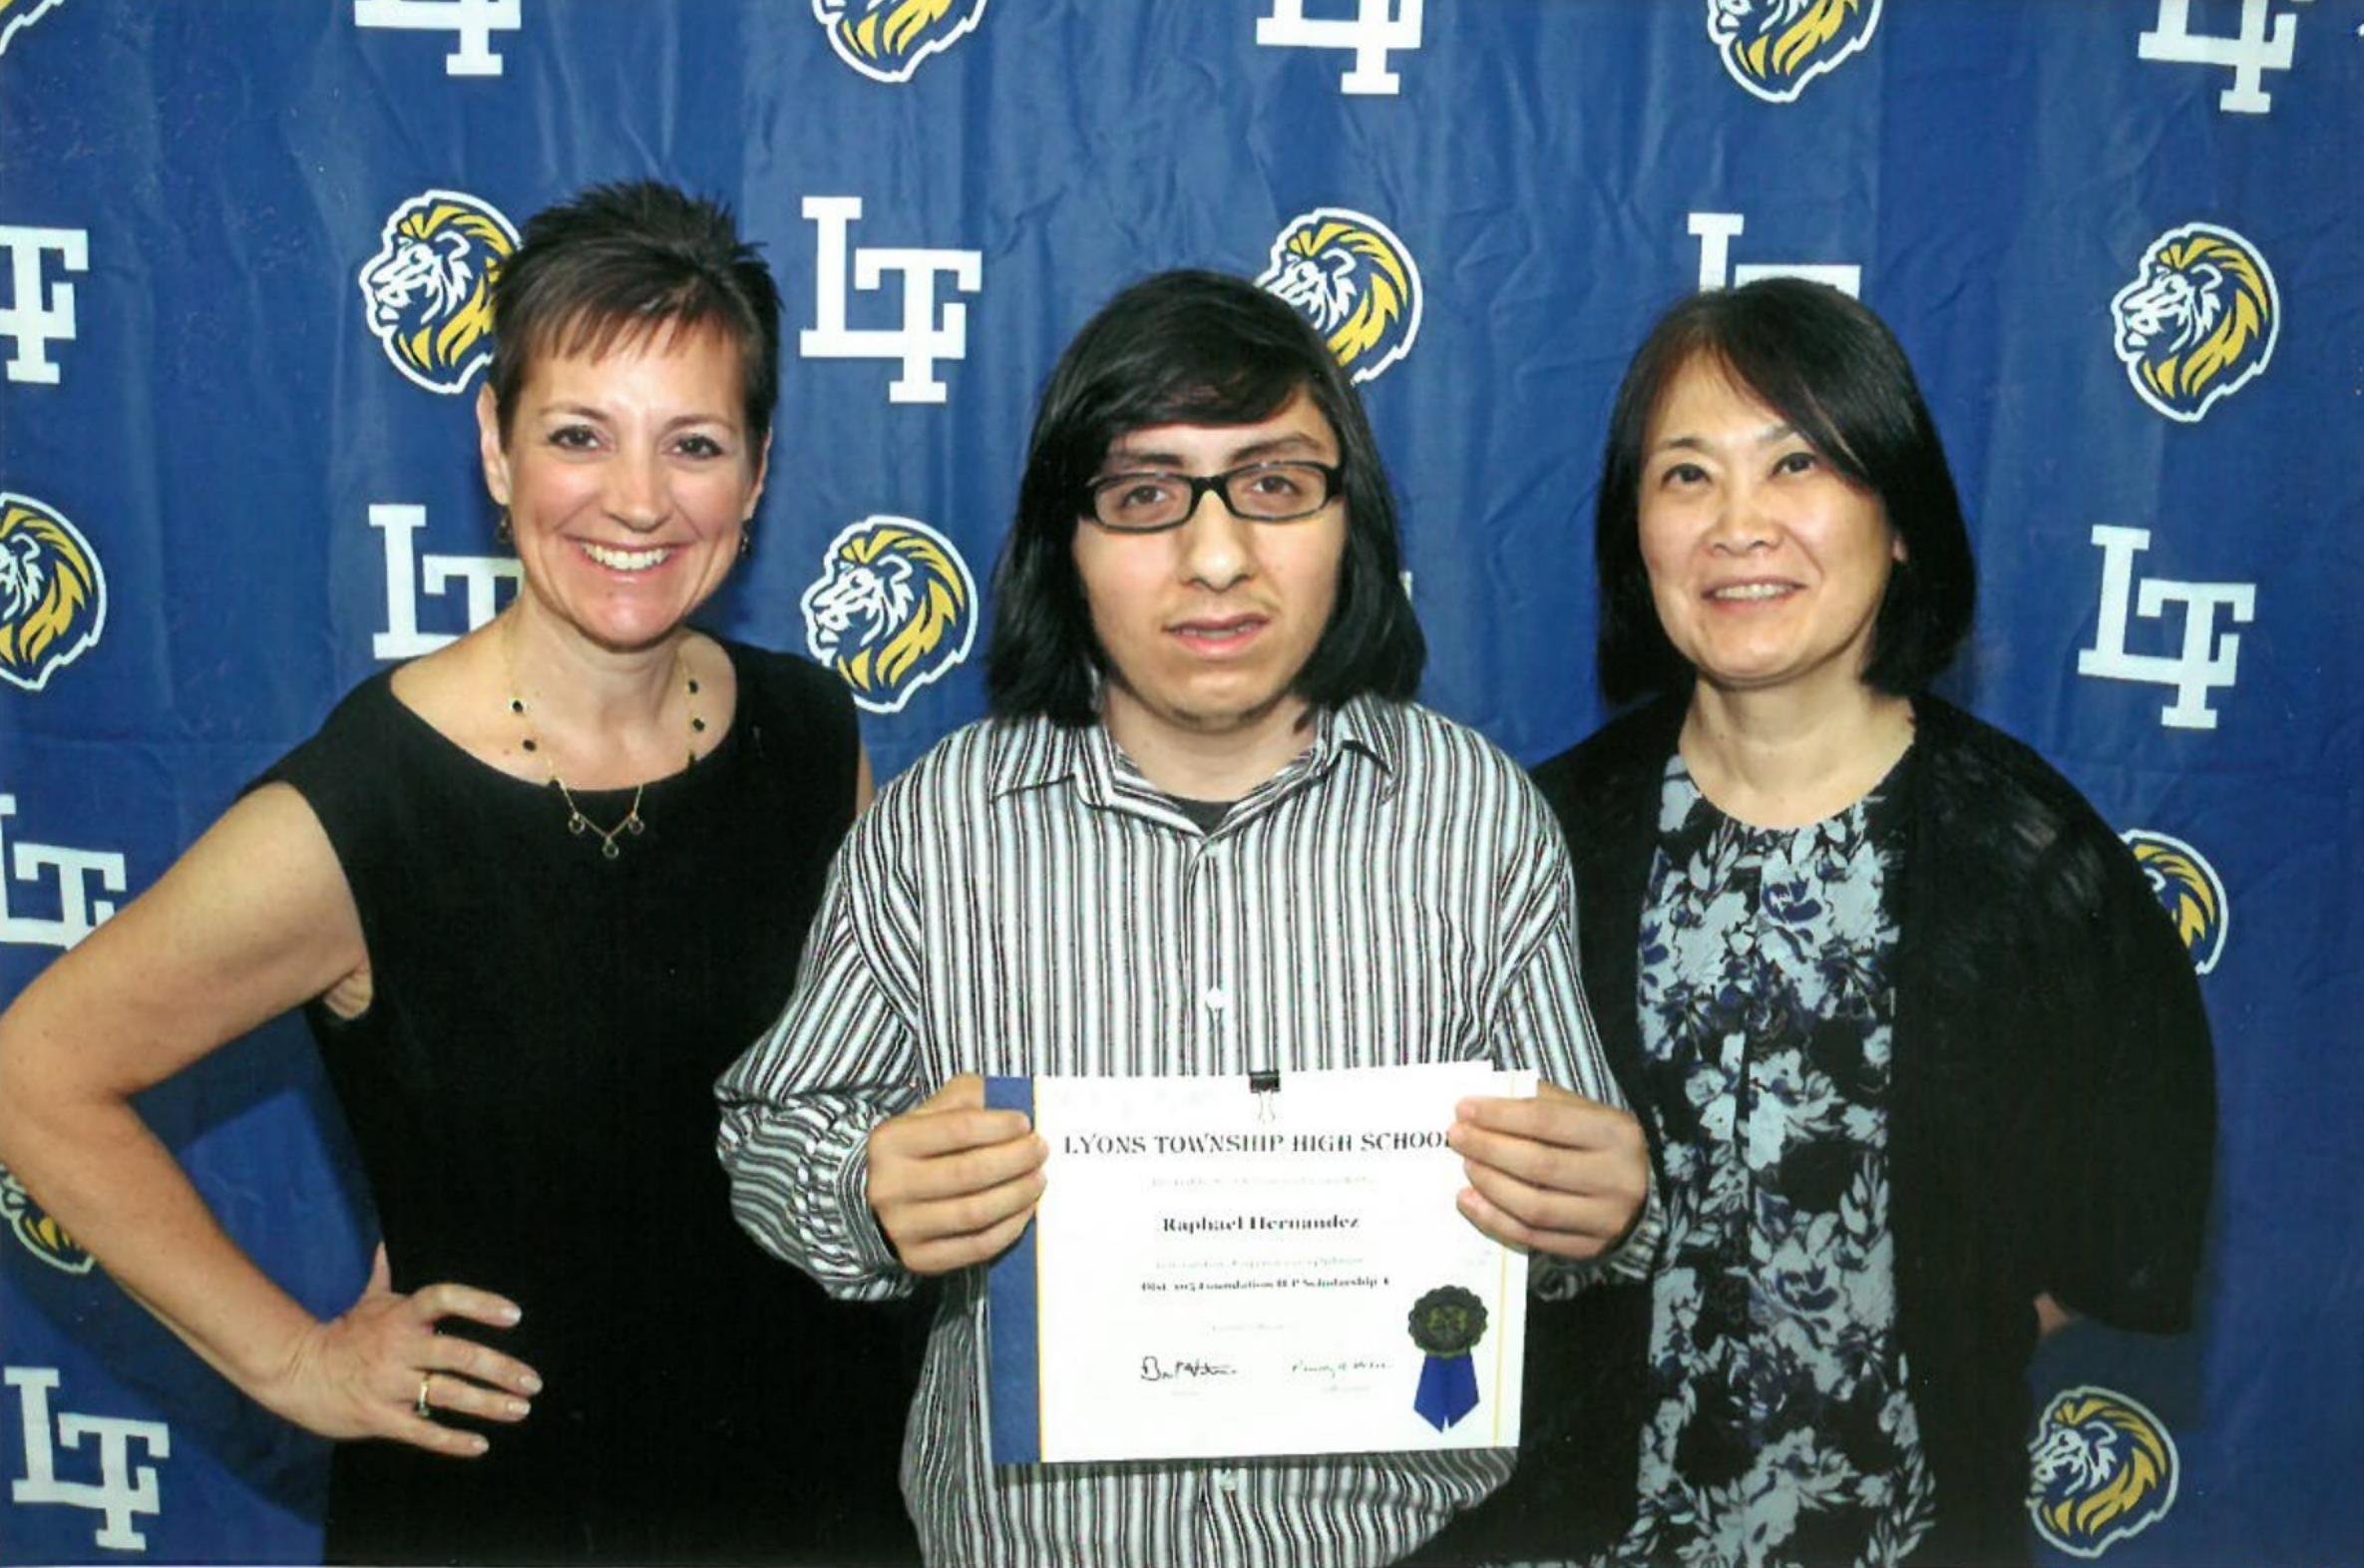 2017 Scholarship Awardee - Pictured (L to R): Mrs. Susan Dixon, Raphael Hernandez, Mrs. Leeza McHugh